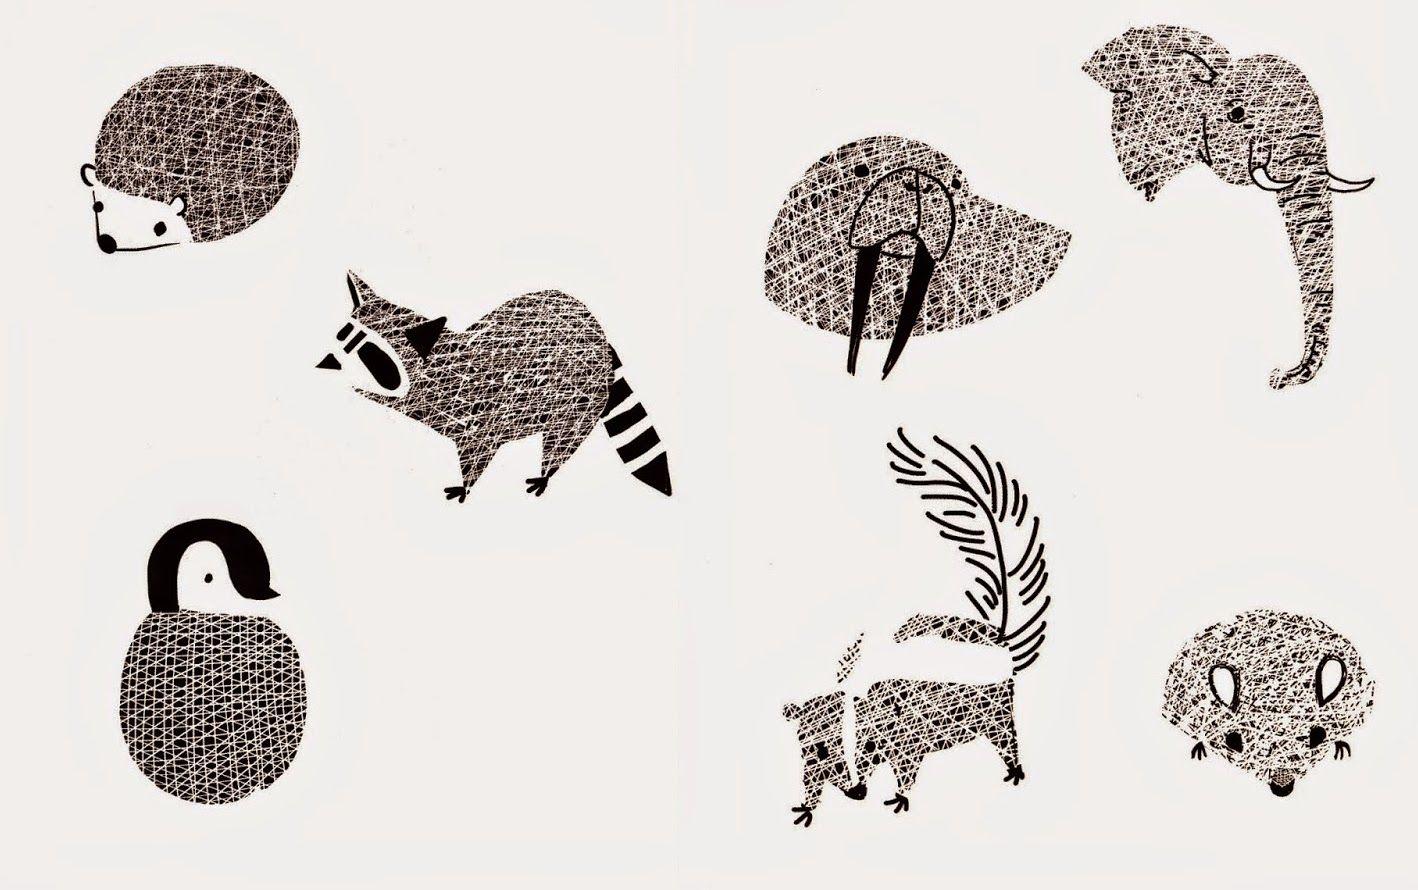 Line Drawing Hedgehog : Raccoon drawing google search spirit animal